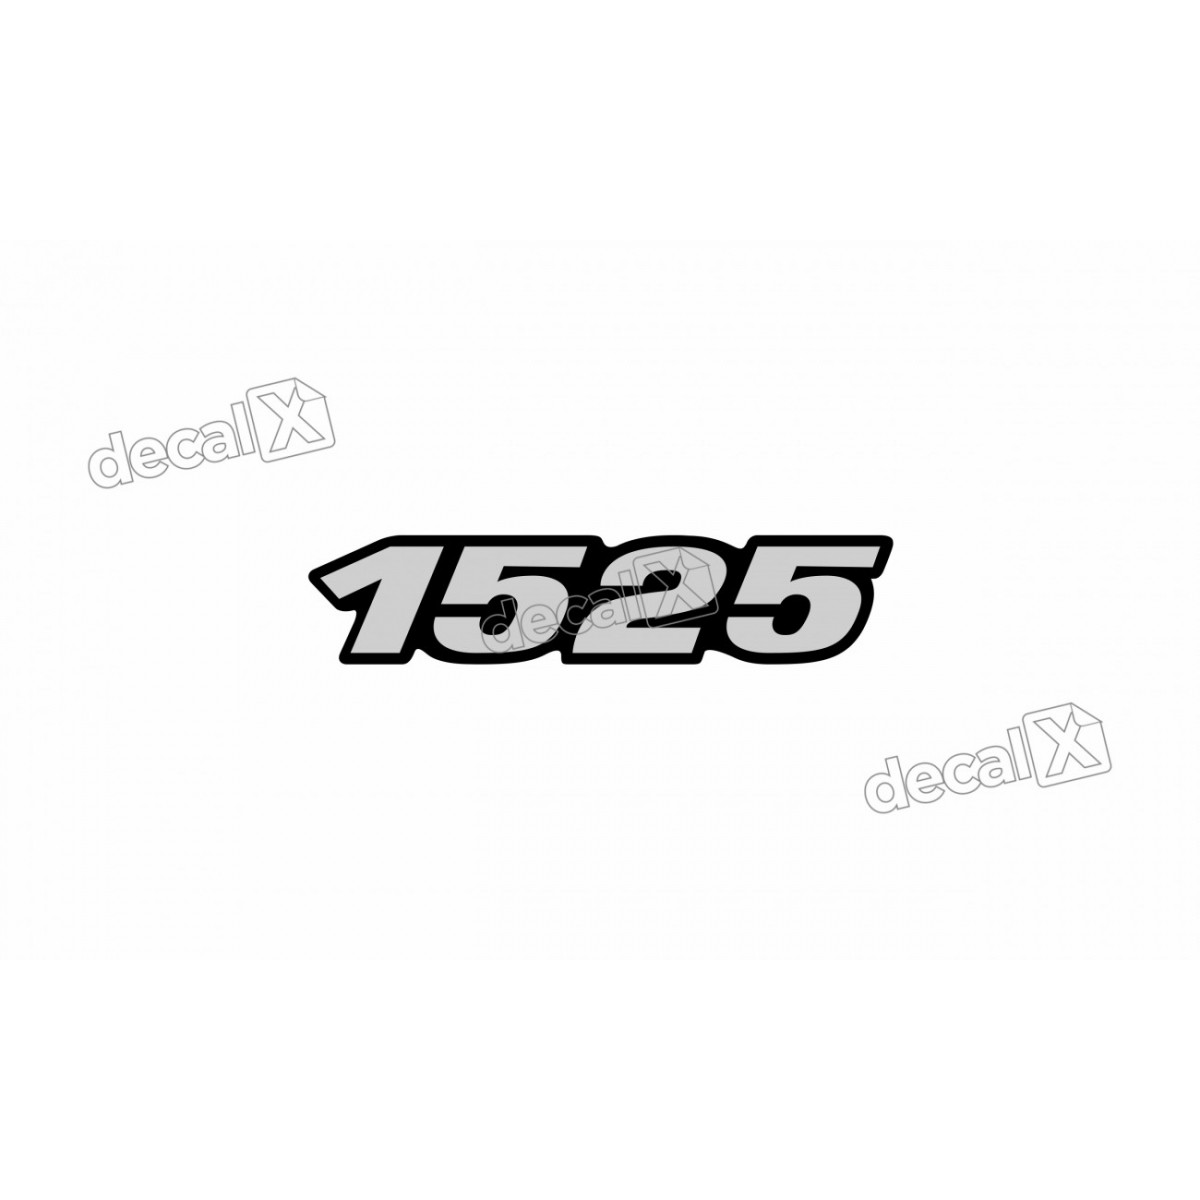 Adesivo Emblema Resinado Mercedes 1525 Cm41 Decalx